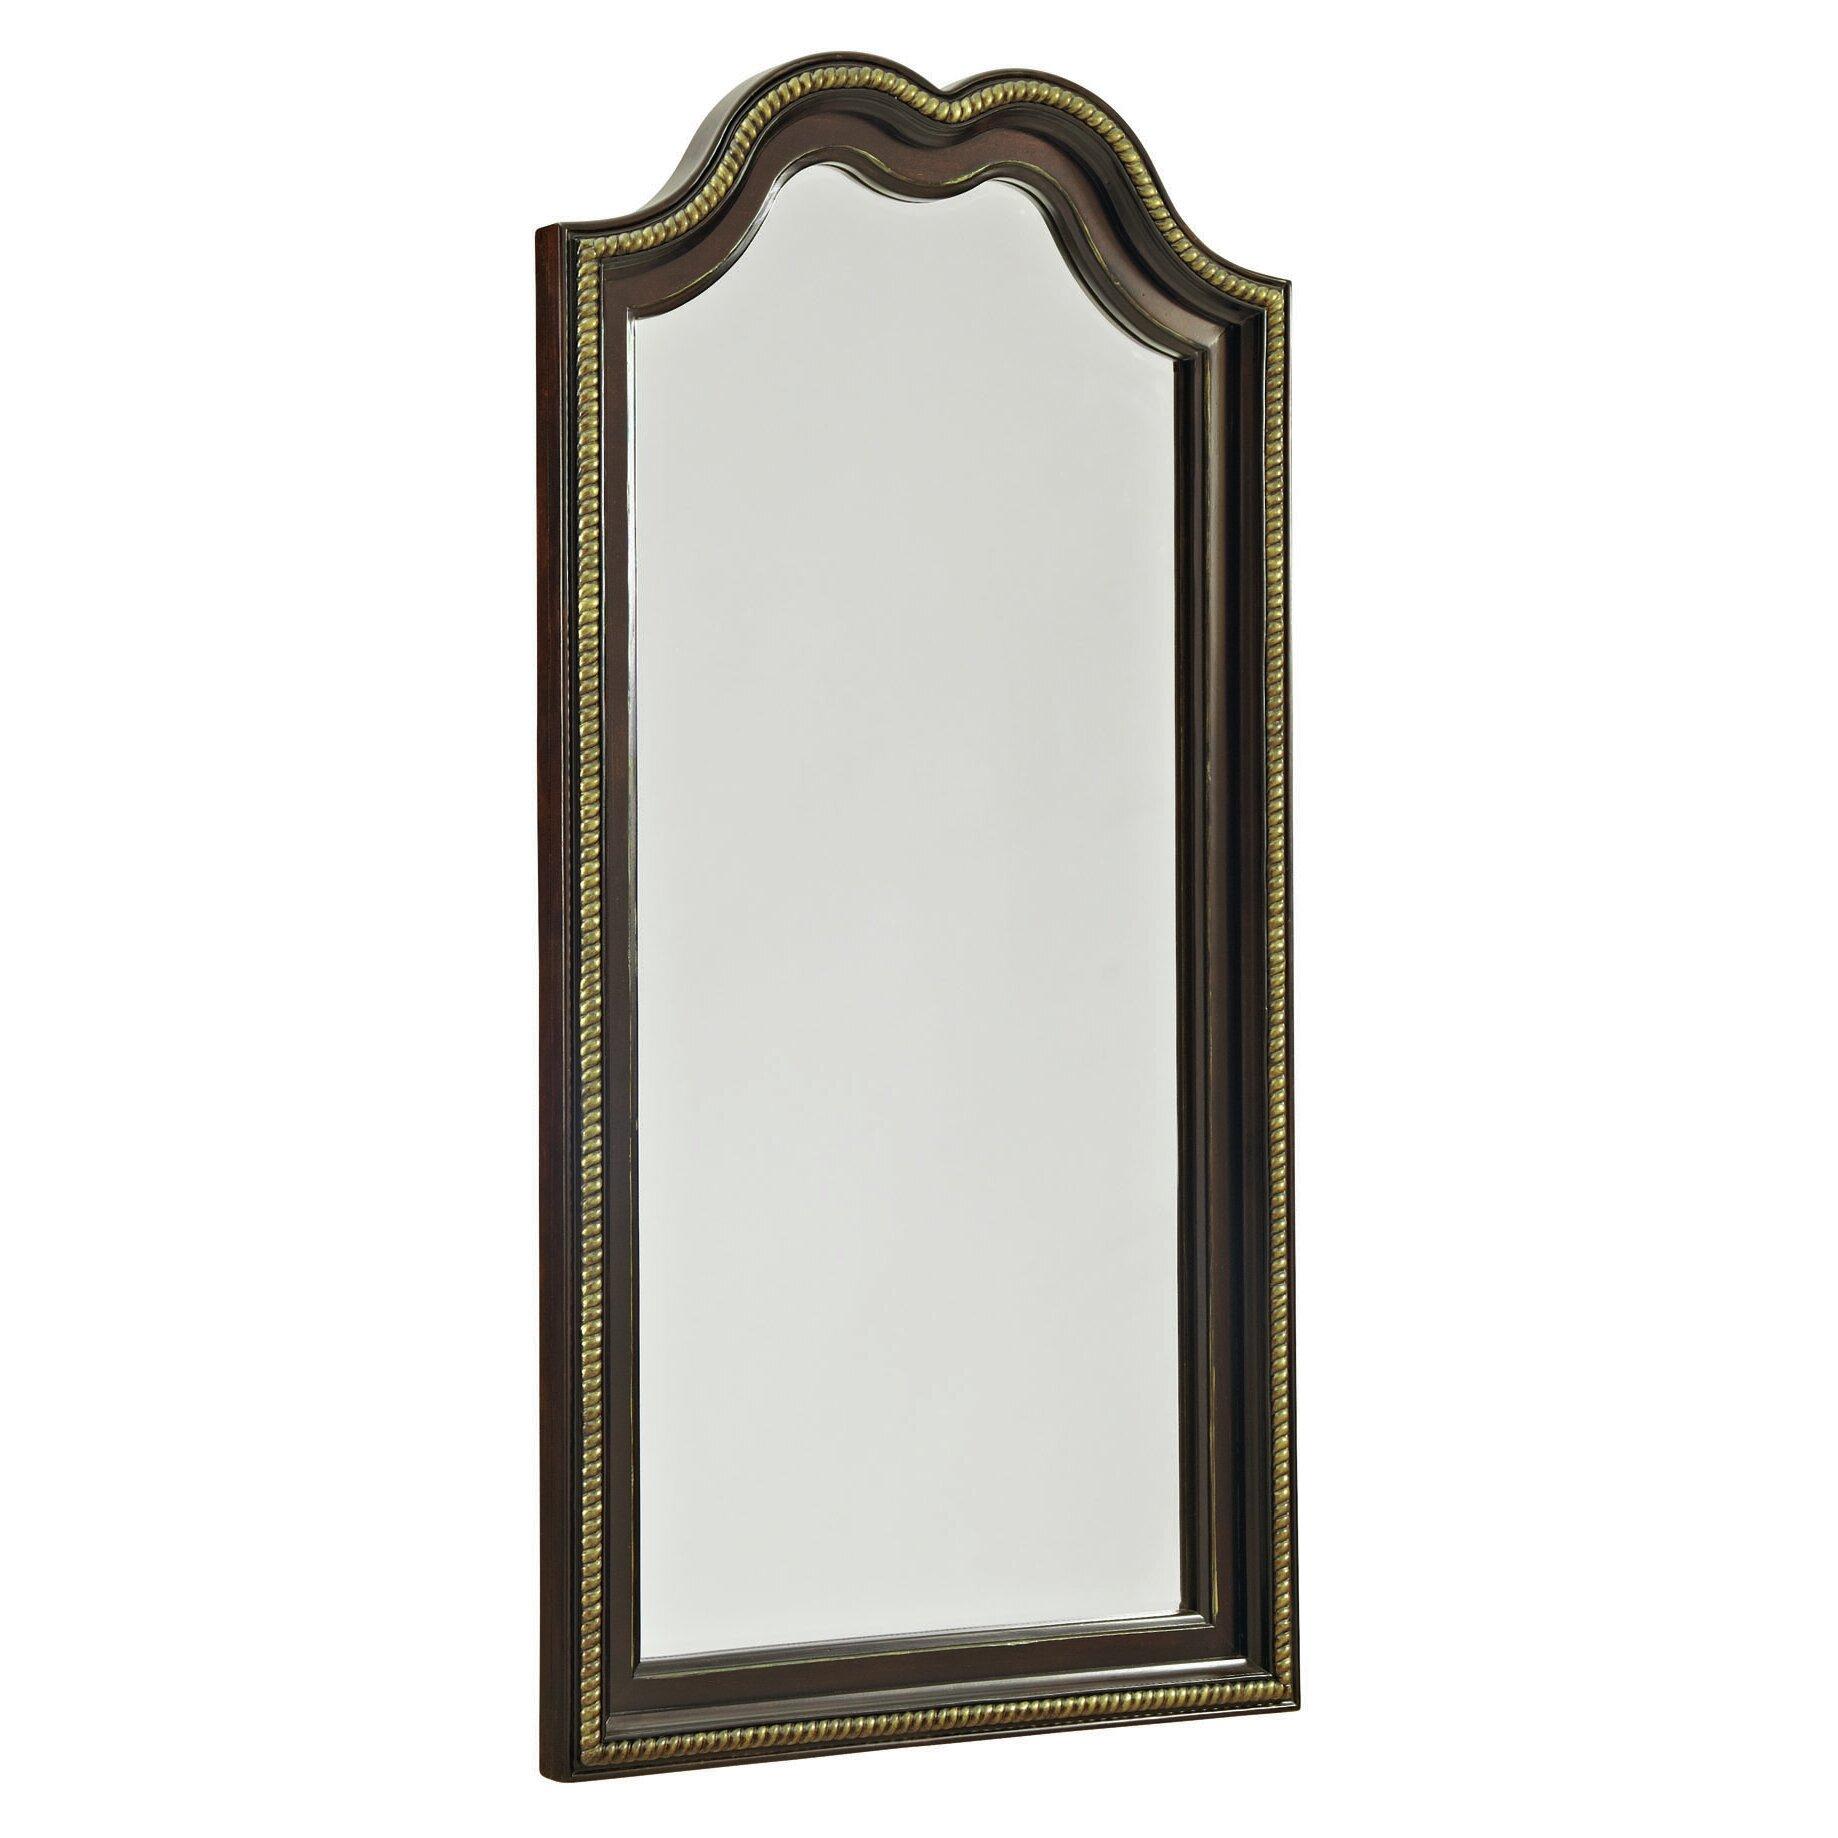 Avalon furniture glam style floor mirror wayfair for Glass floor mirror